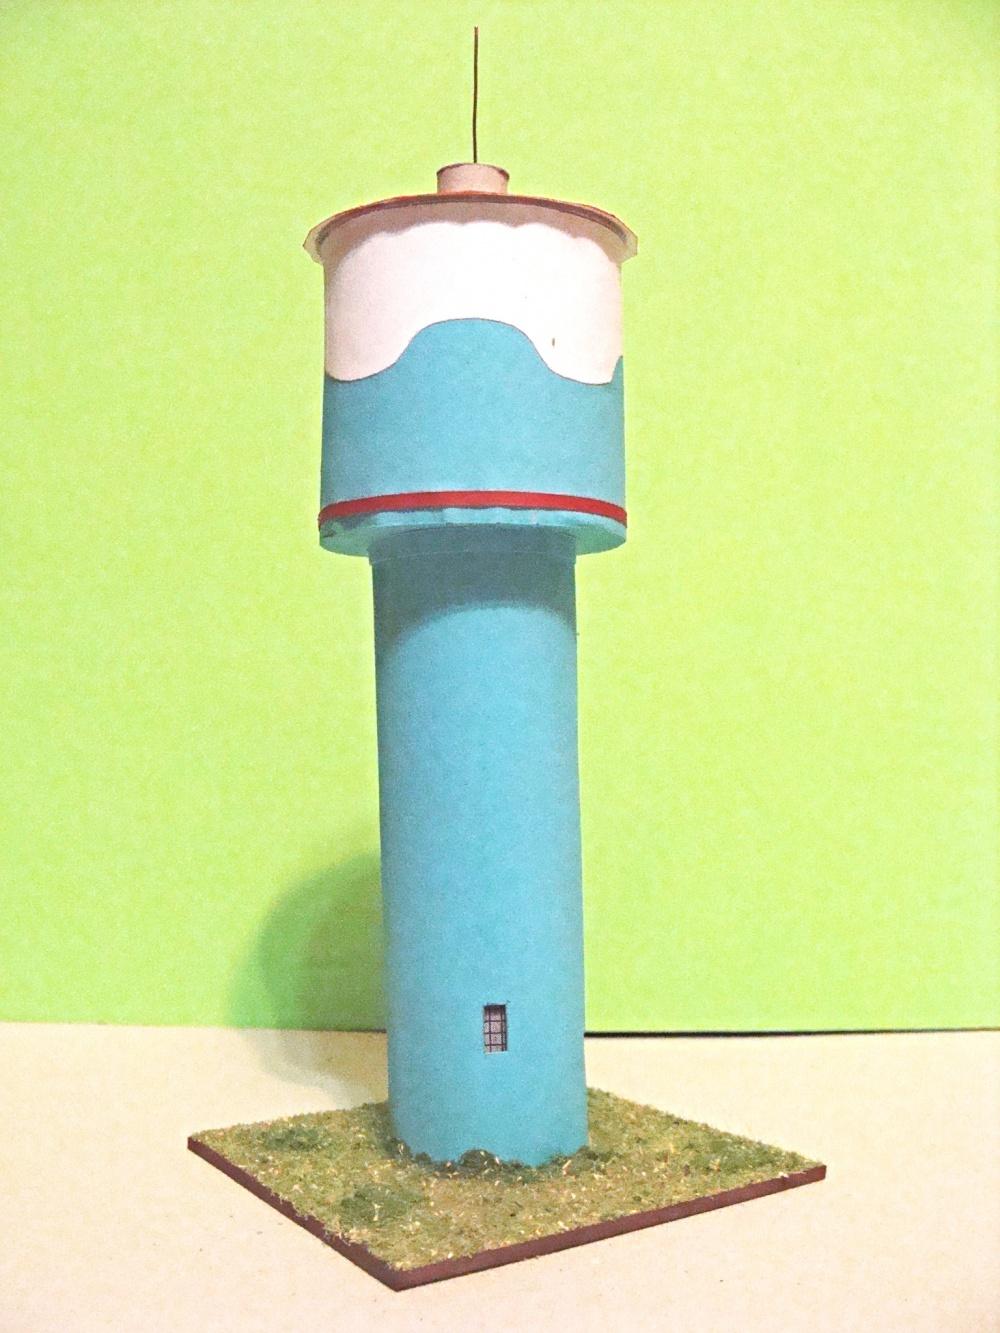 vodojem Partutovice